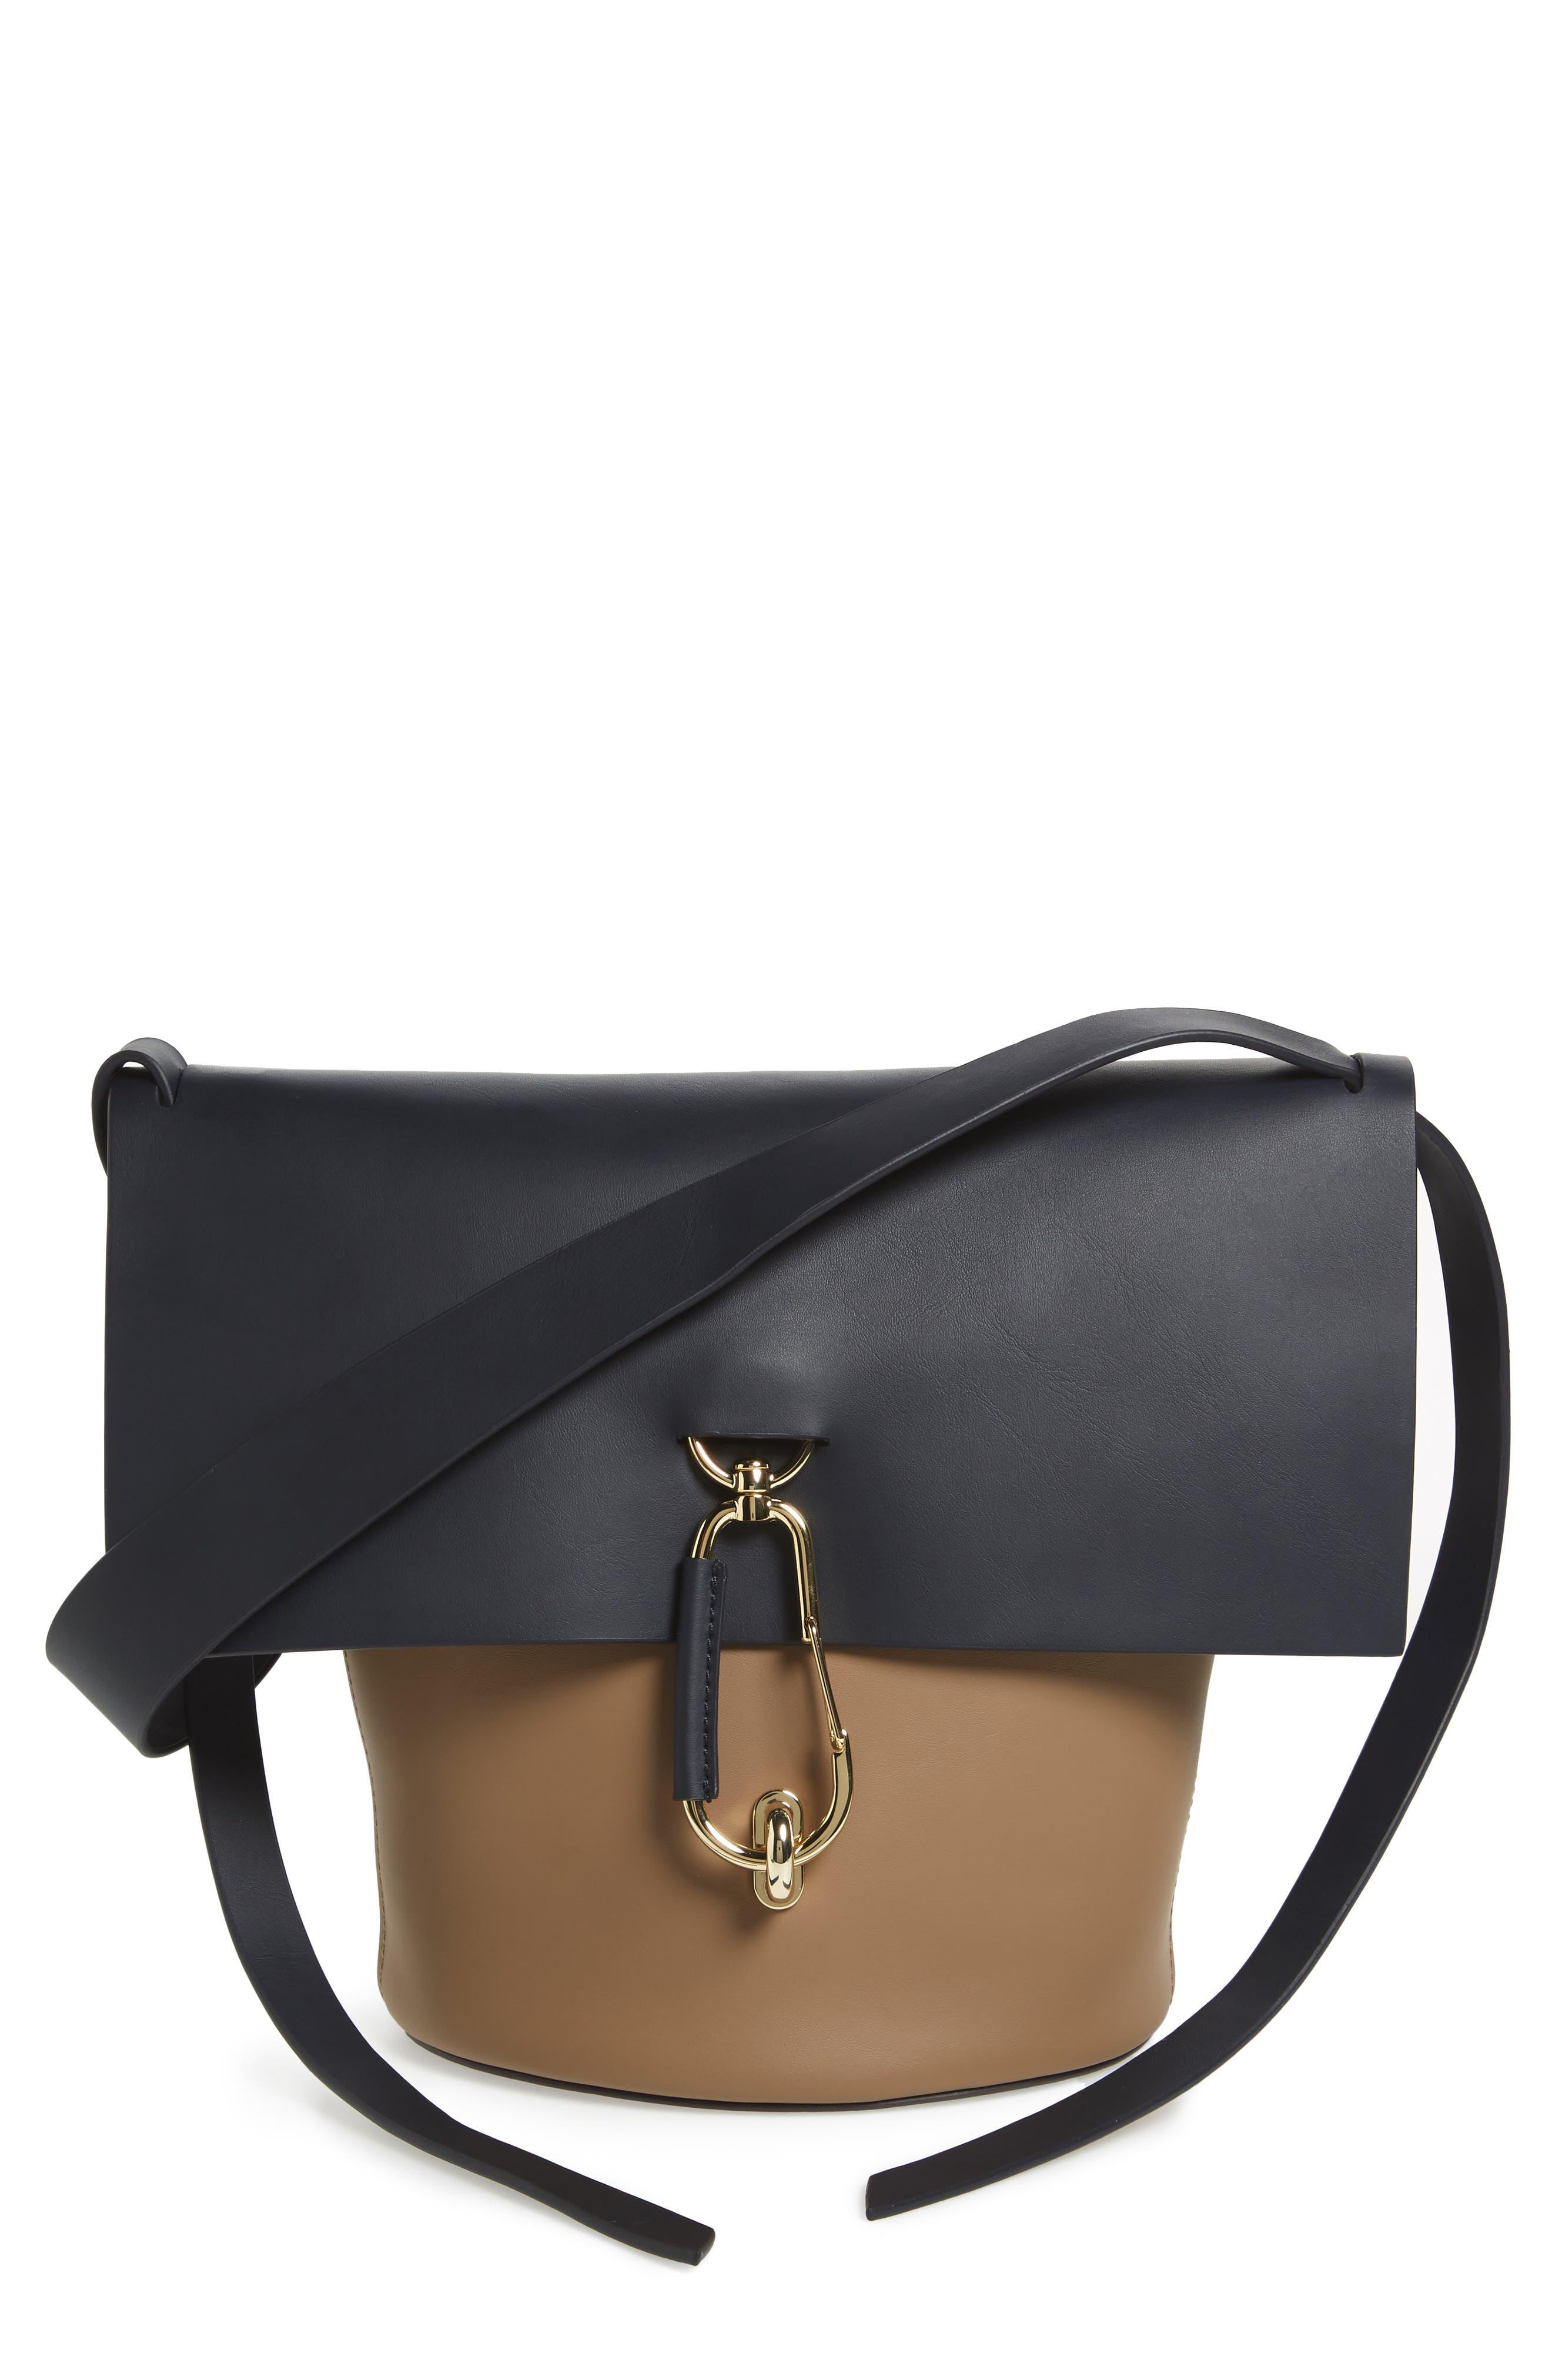 Belay Colorblock Calfskin Leather Bucket Bag,                             Main thumbnail 1, color,                             Navy Color Block